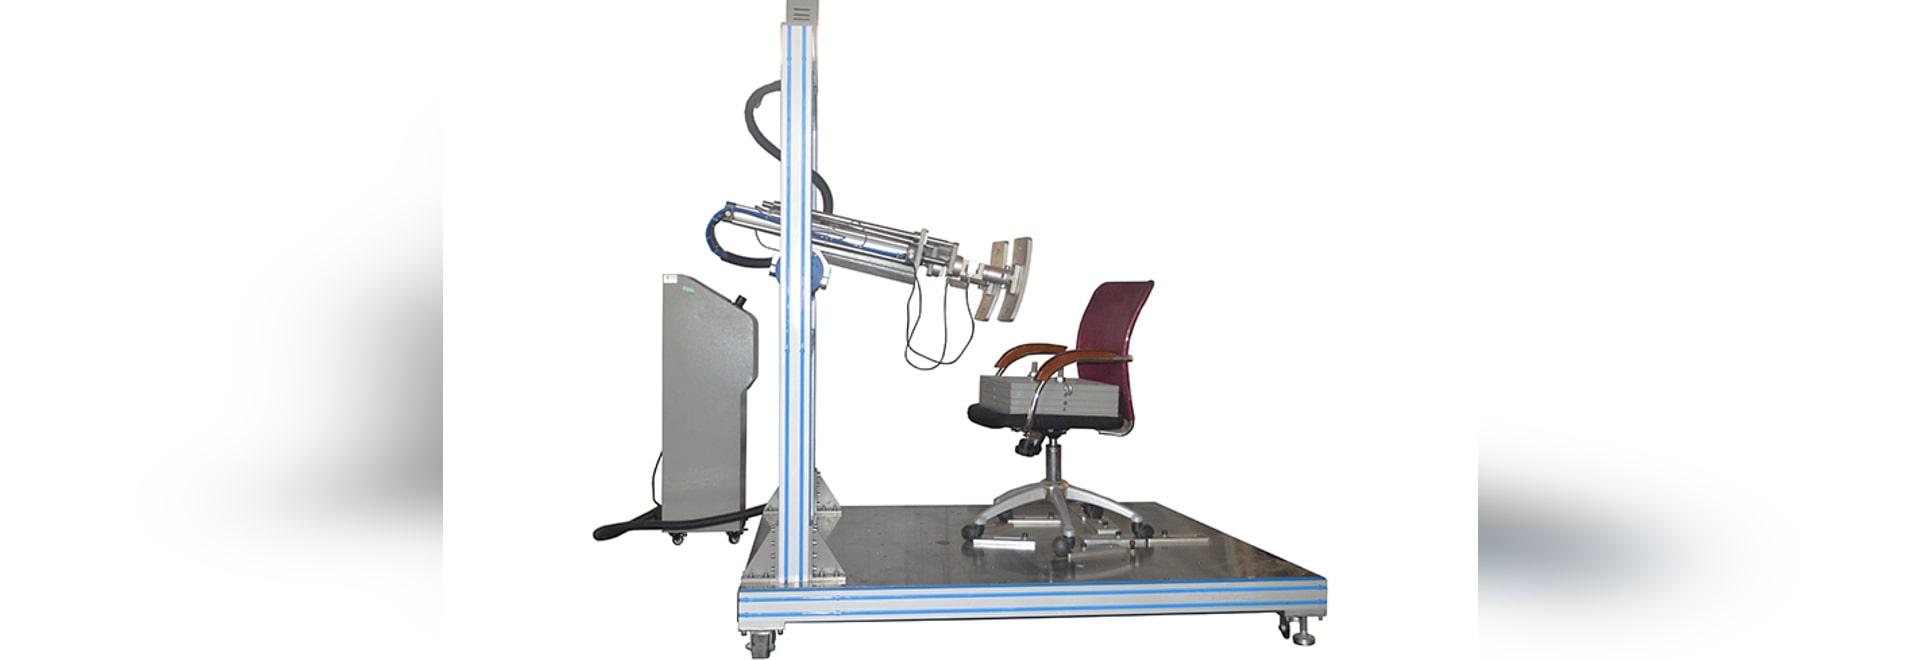 Office Chair Back Durability Testing Equipment